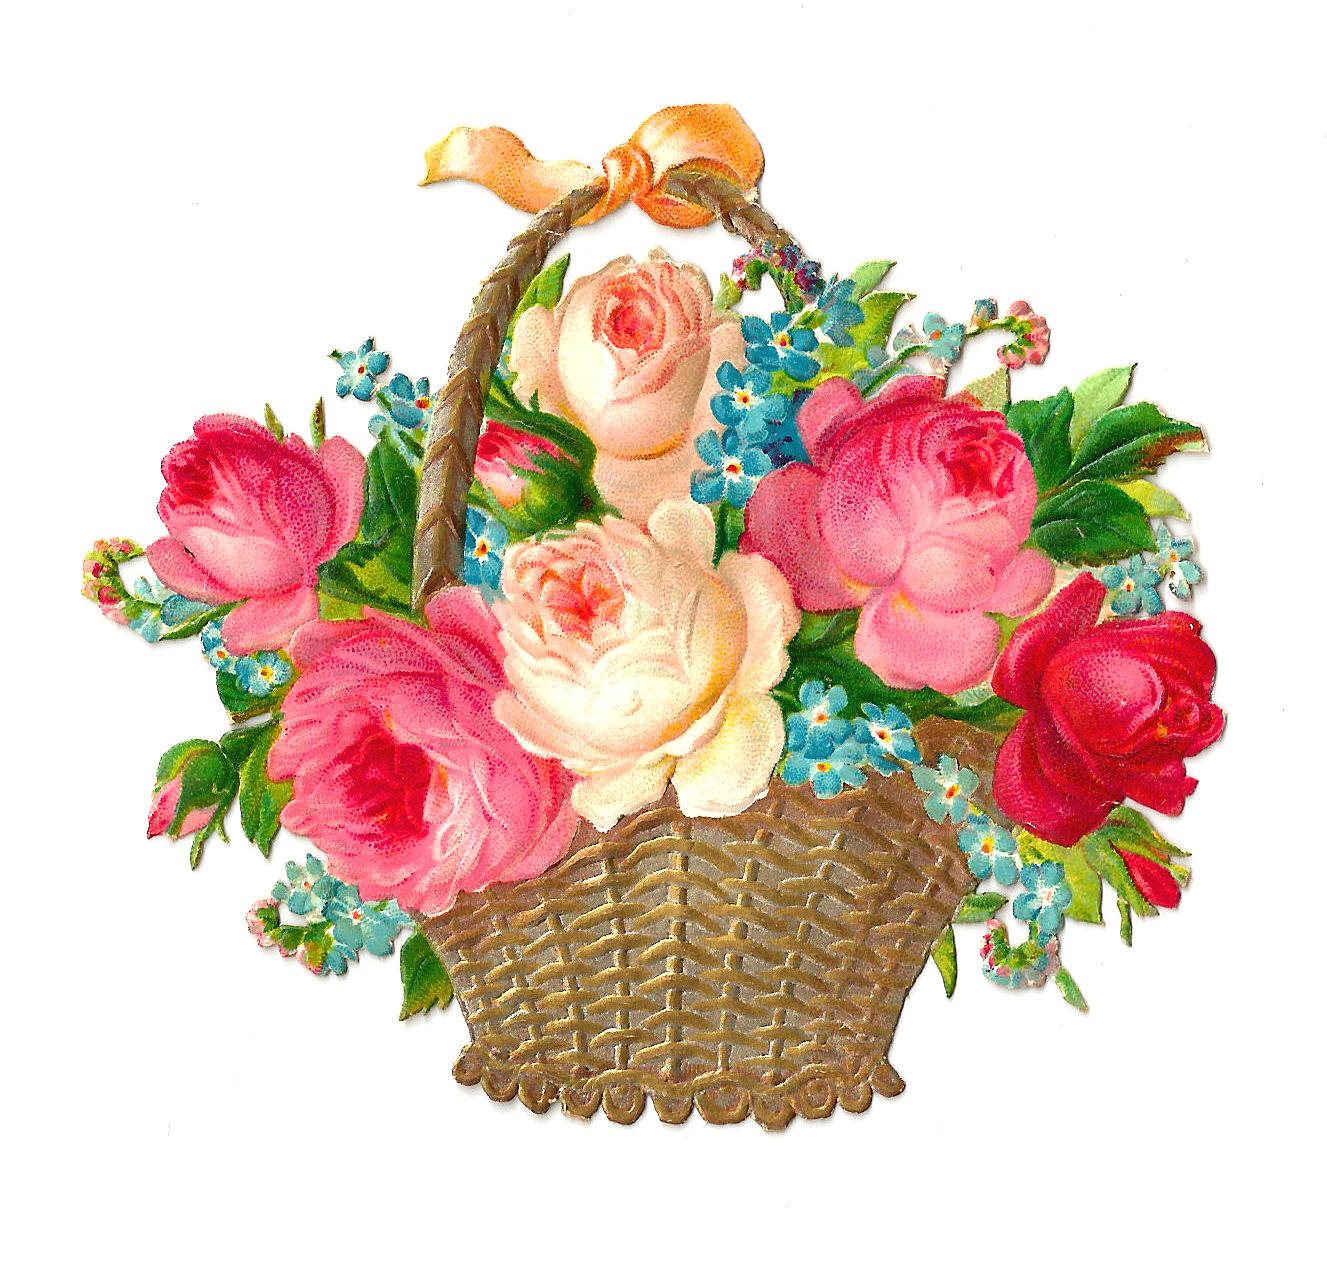 http://3.bp.blogspot.com/-P0aUSfJ1U-A/UGHk1nzryNI/AAAAAAAAD7w/IJaFUbVOcRs/s1600/flowerbasket2.jpg